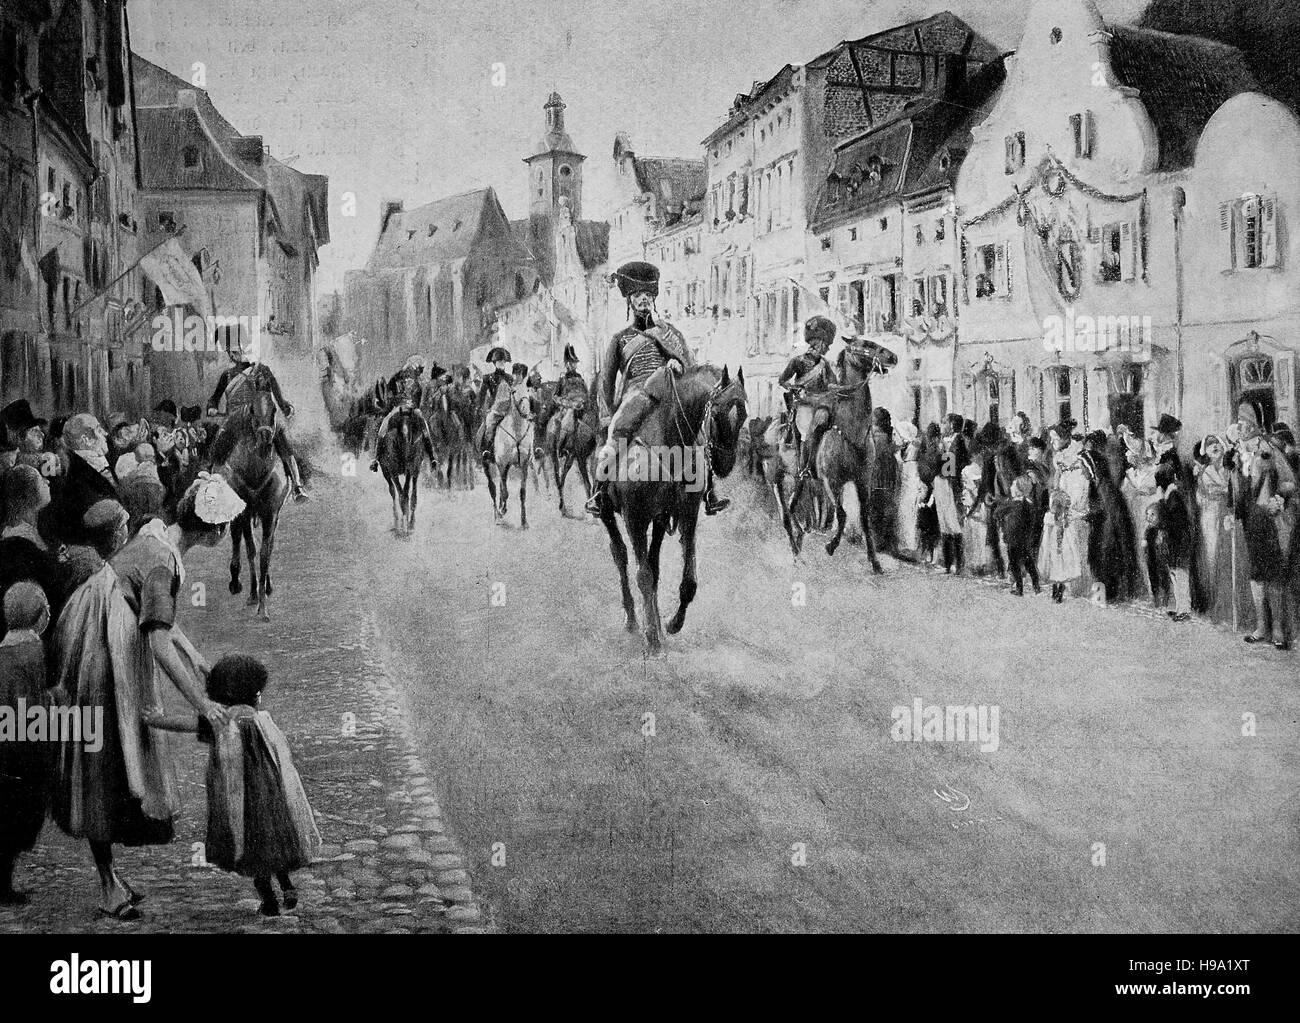 Napoleon passes through a city, historical illustration - Stock Image